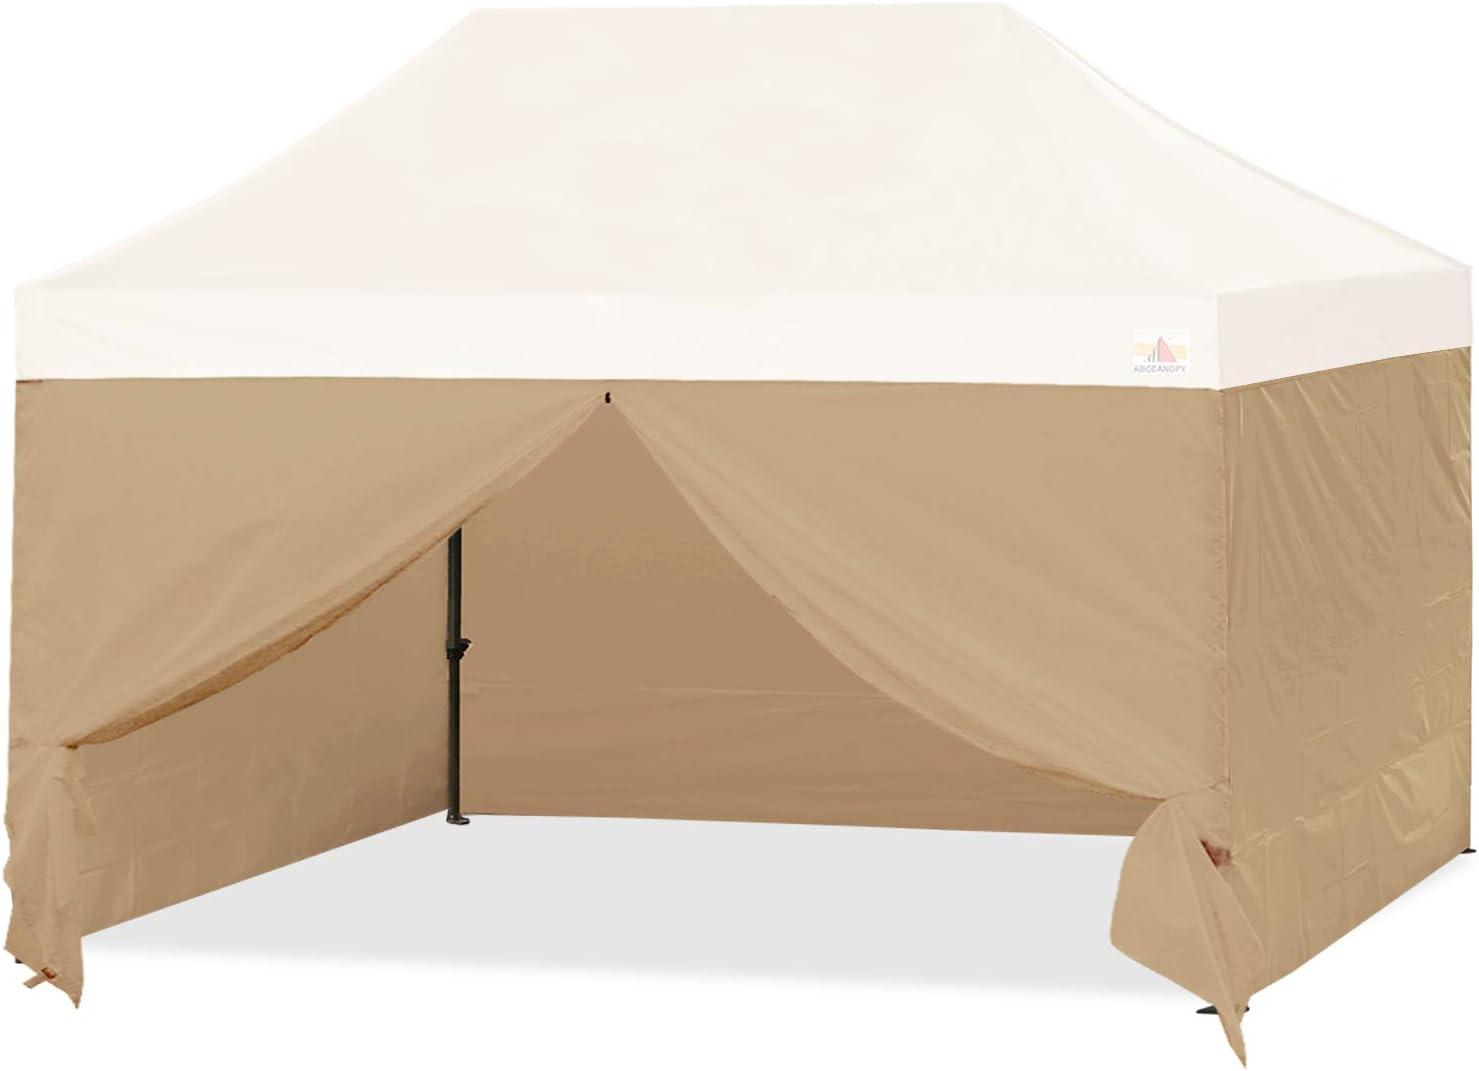 ABCCANOPY Sidewall Kit,Canopy Tent Side Walls 10x15,4 Walls ONLY (Beige)